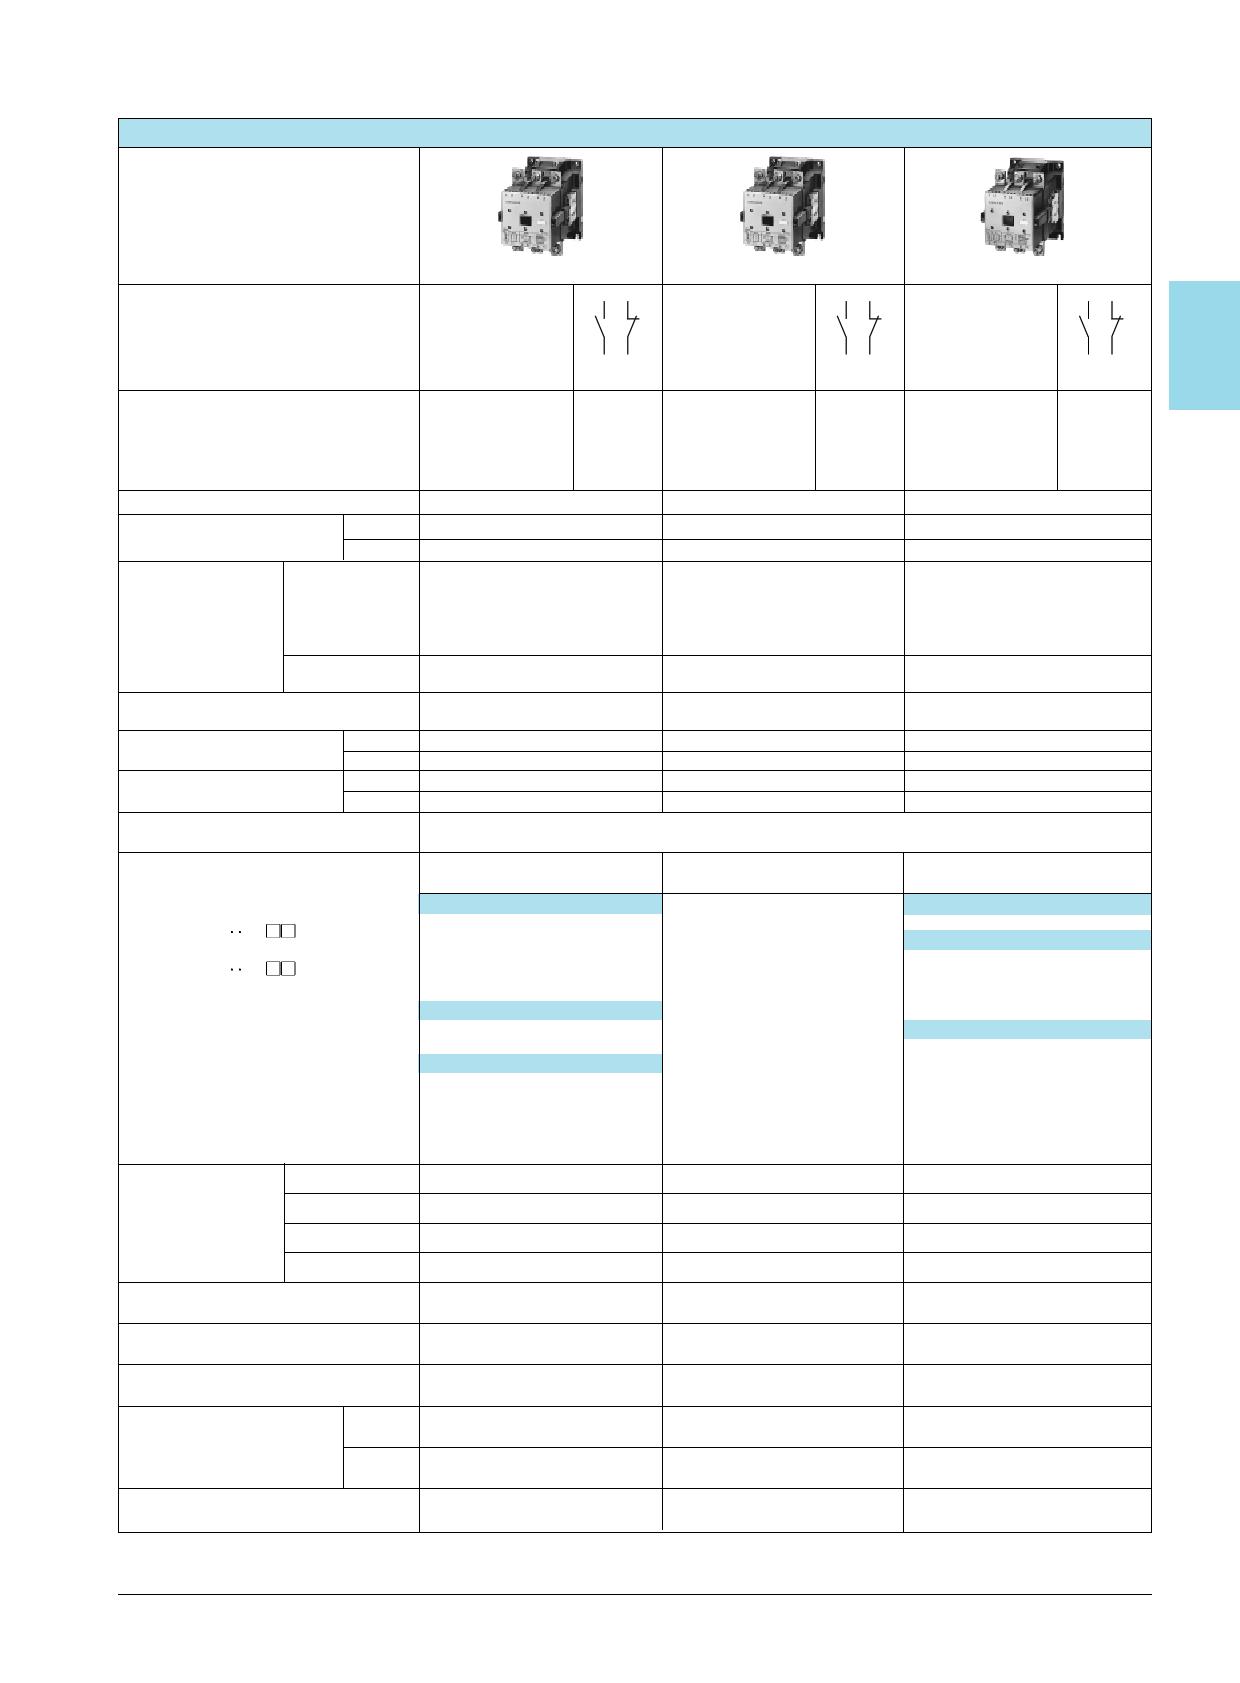 3TF40 Datasheet, Funktion